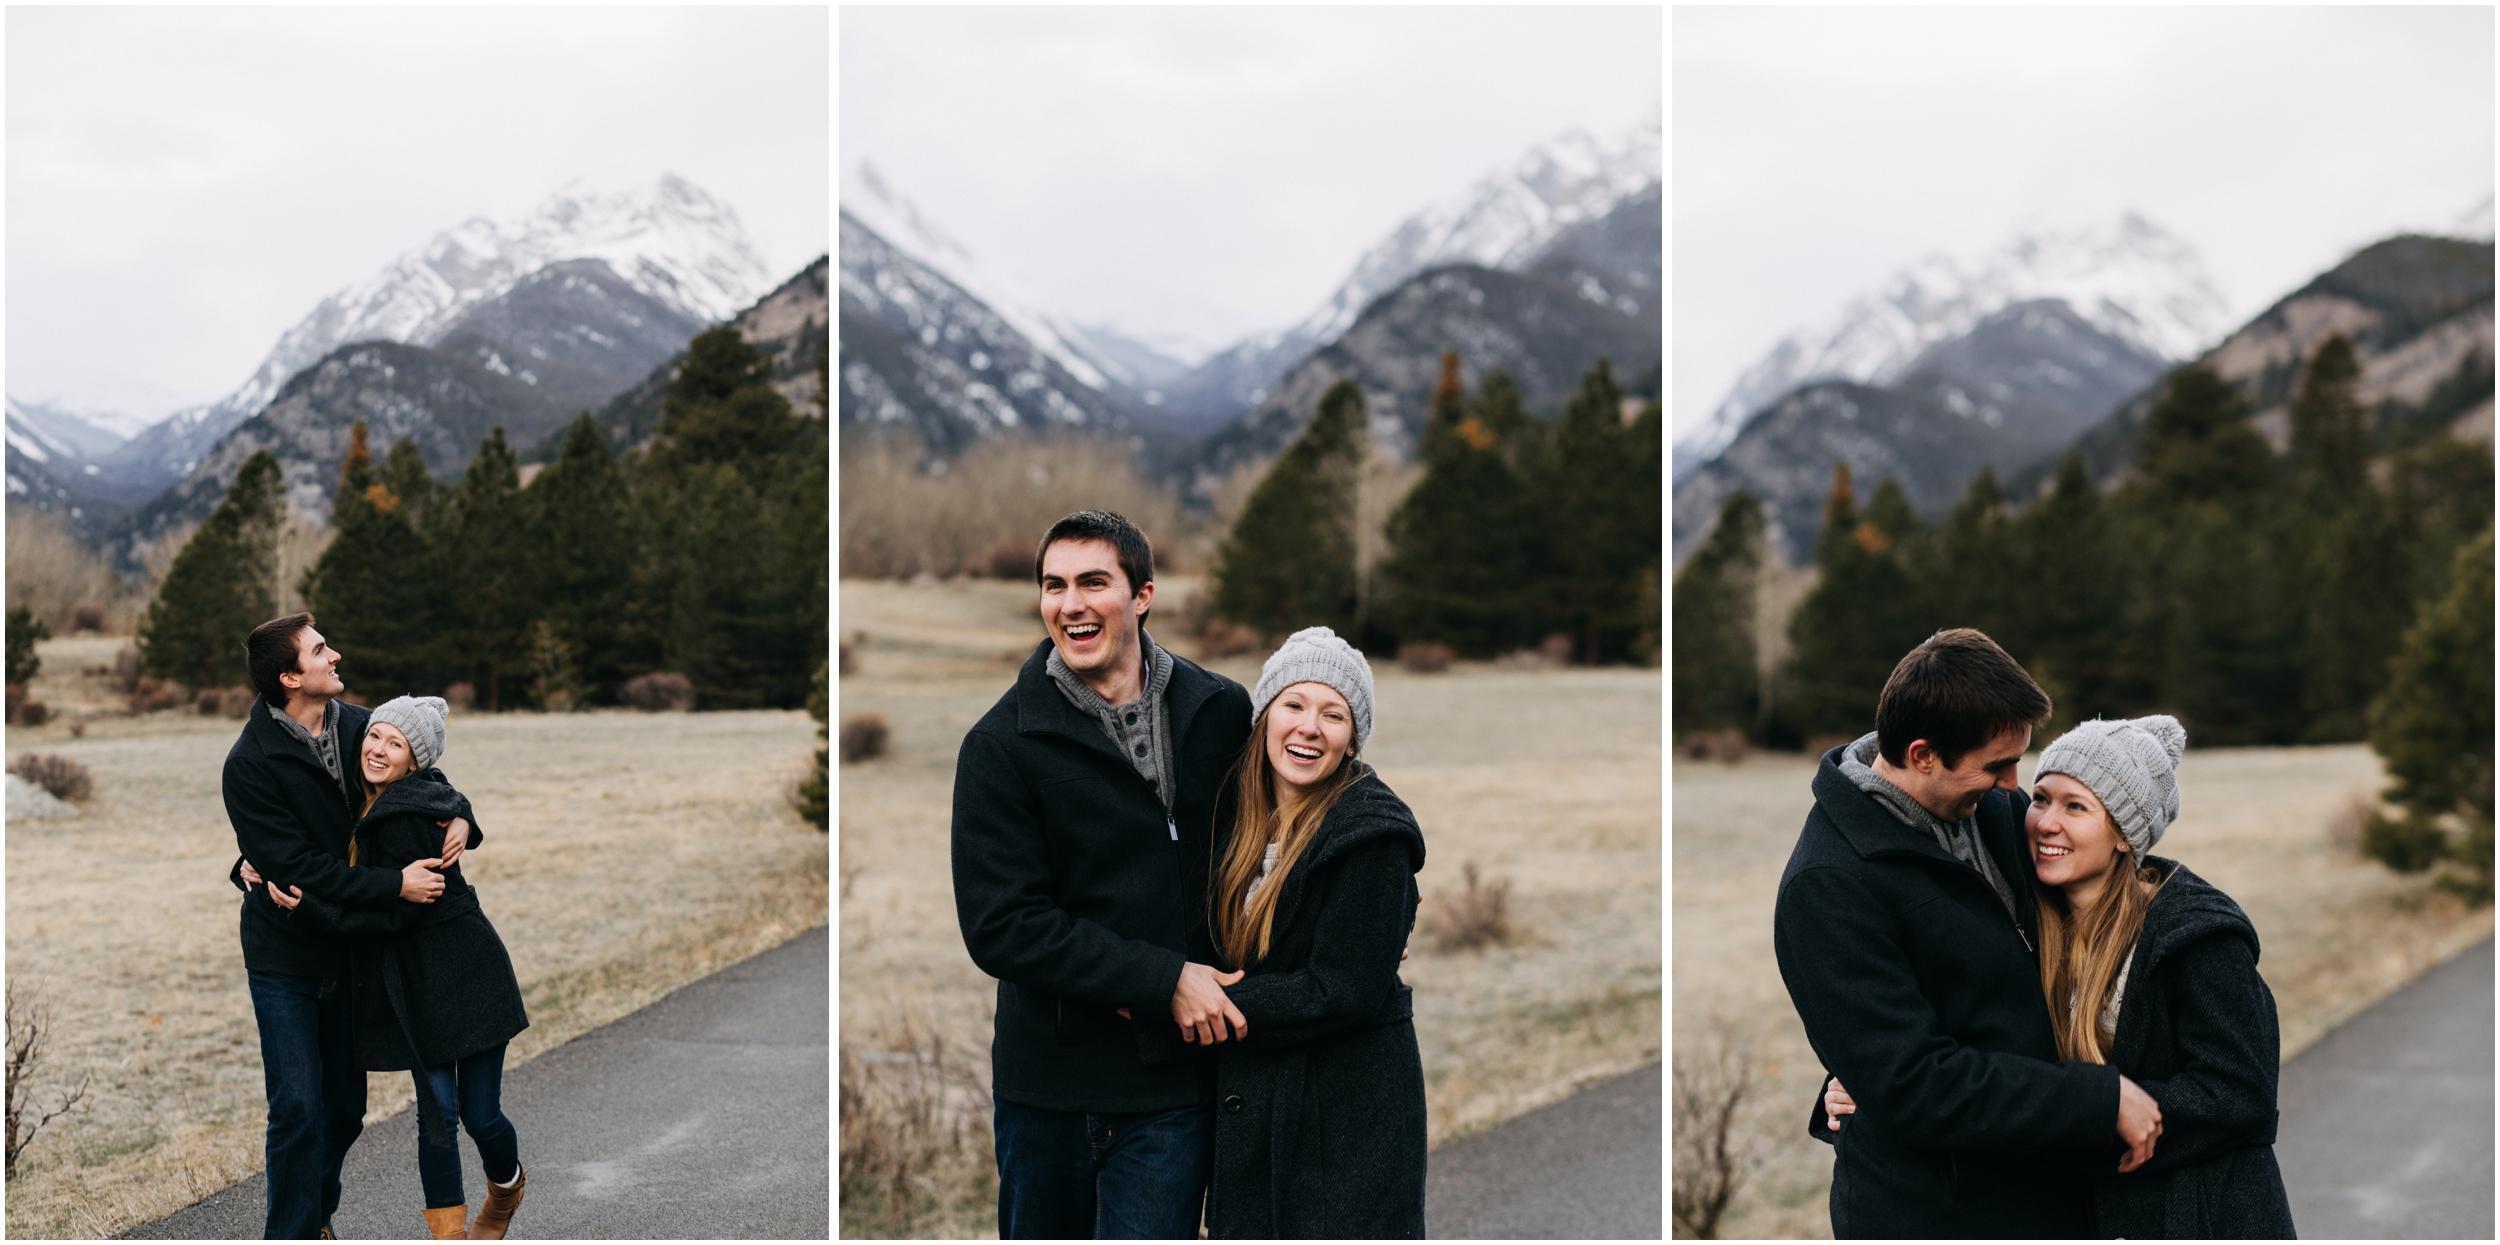 rocky-mountain-national-park-engagement-session-colorado-wedding-photographer-endo-valley__0109.jpg